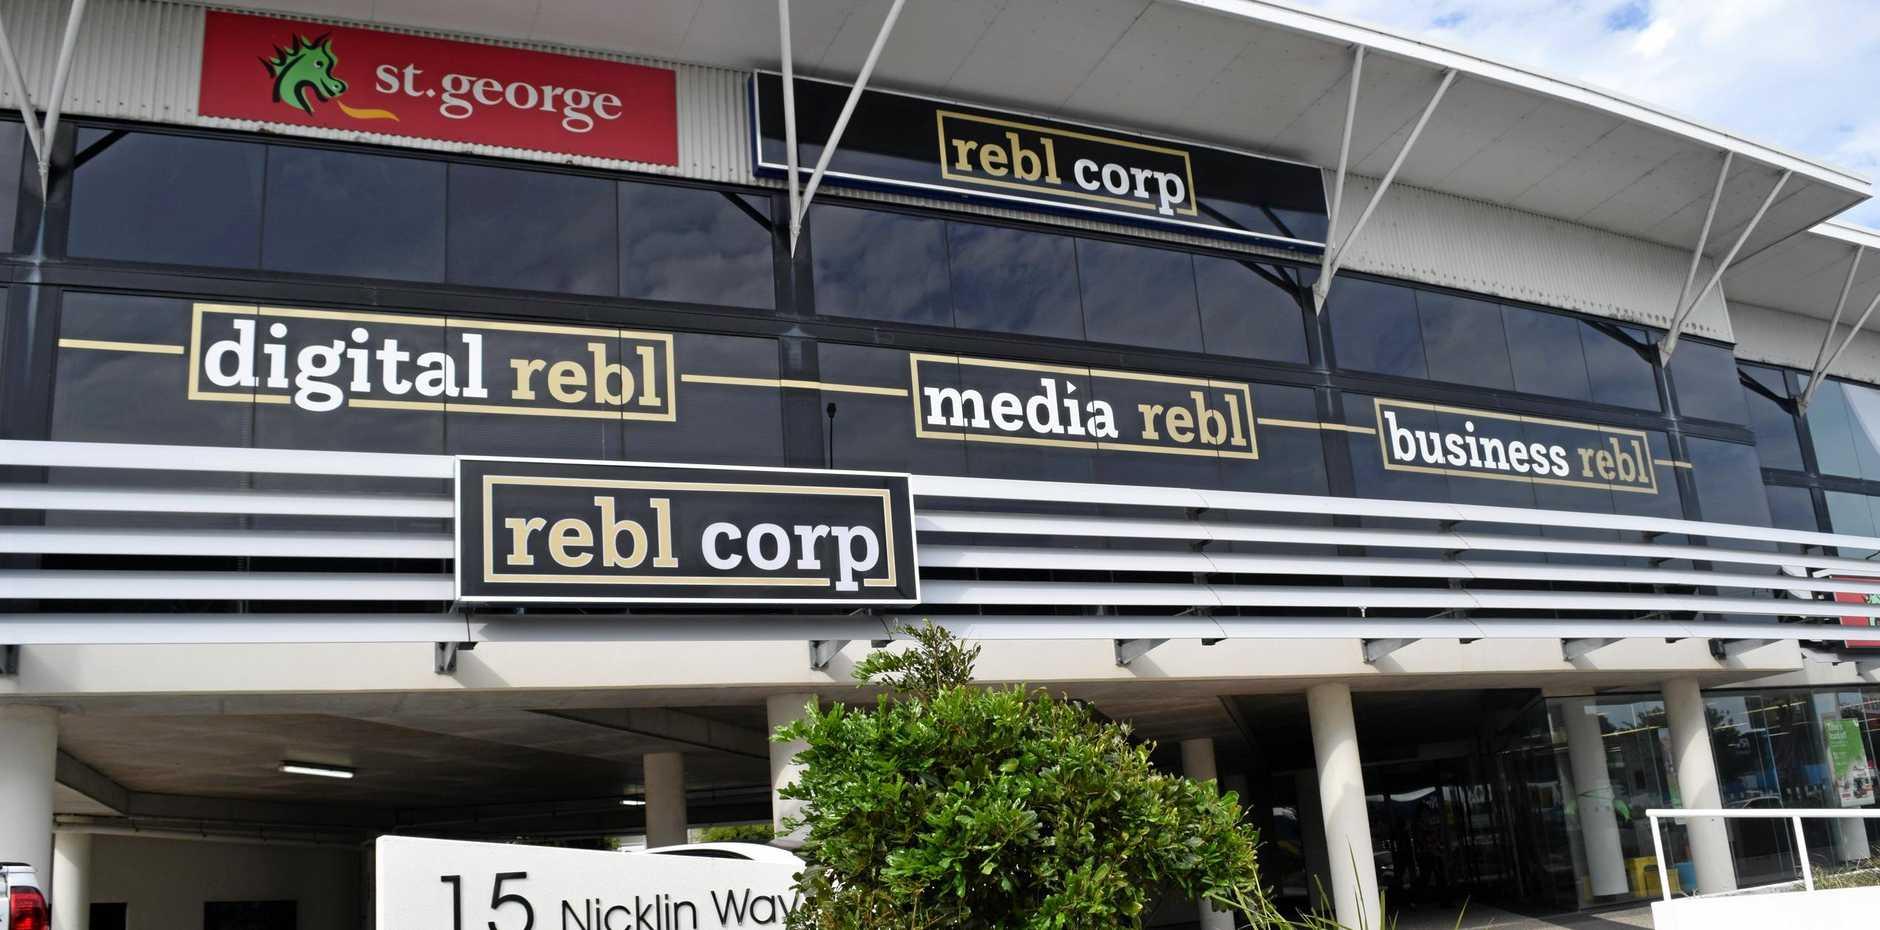 Rebl Corp has shut its doors leaving dozens of staff without jobs.